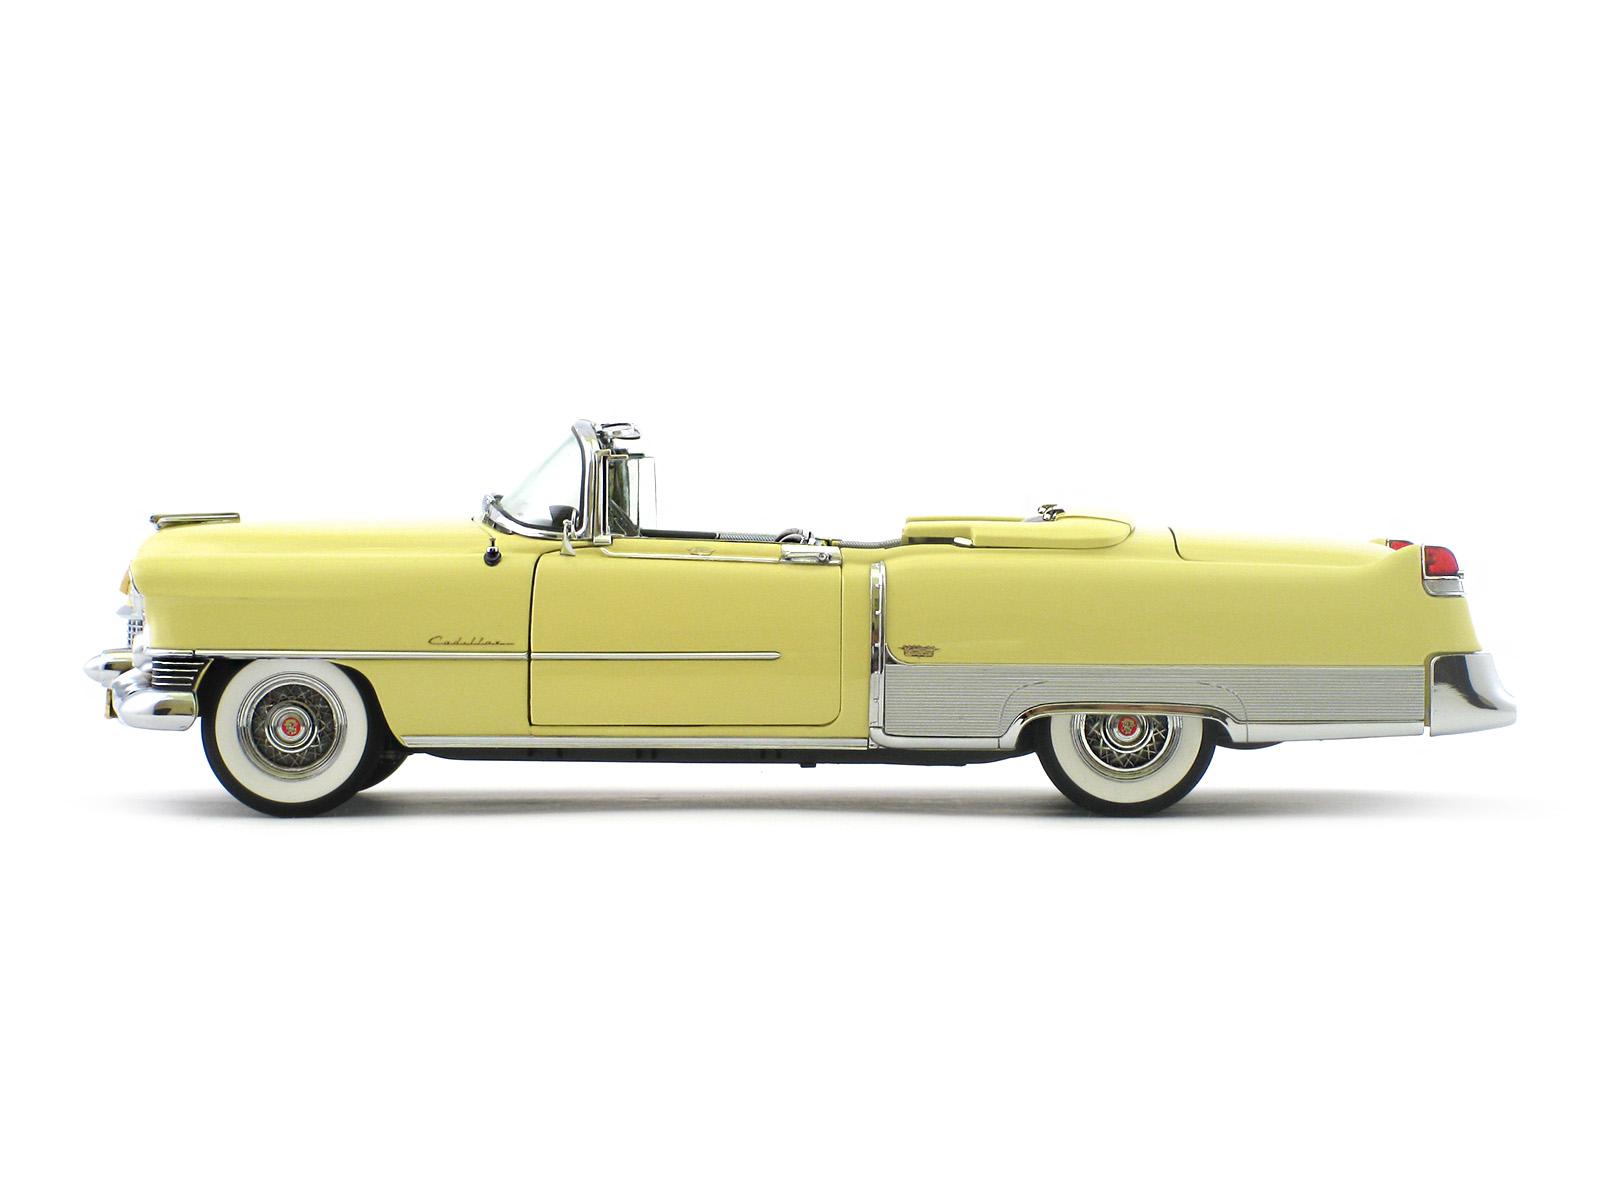 1954 Cadillac Eldorado Convertible Danbury Mint El Dorado June 12 2017 Get Link Facebook Twitter Pinterest Google Email Other Apps